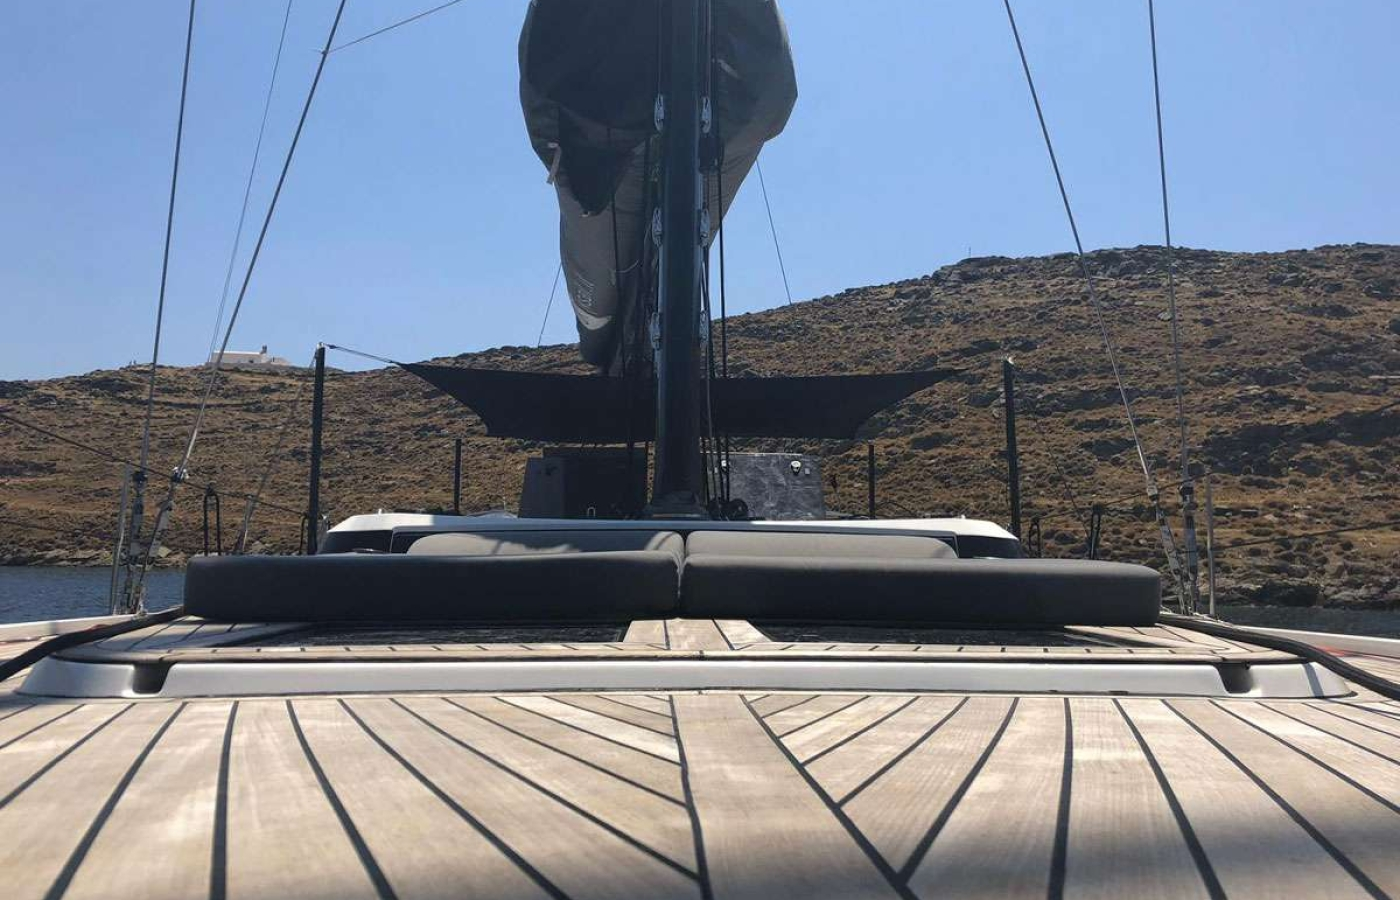 Floor of the boat